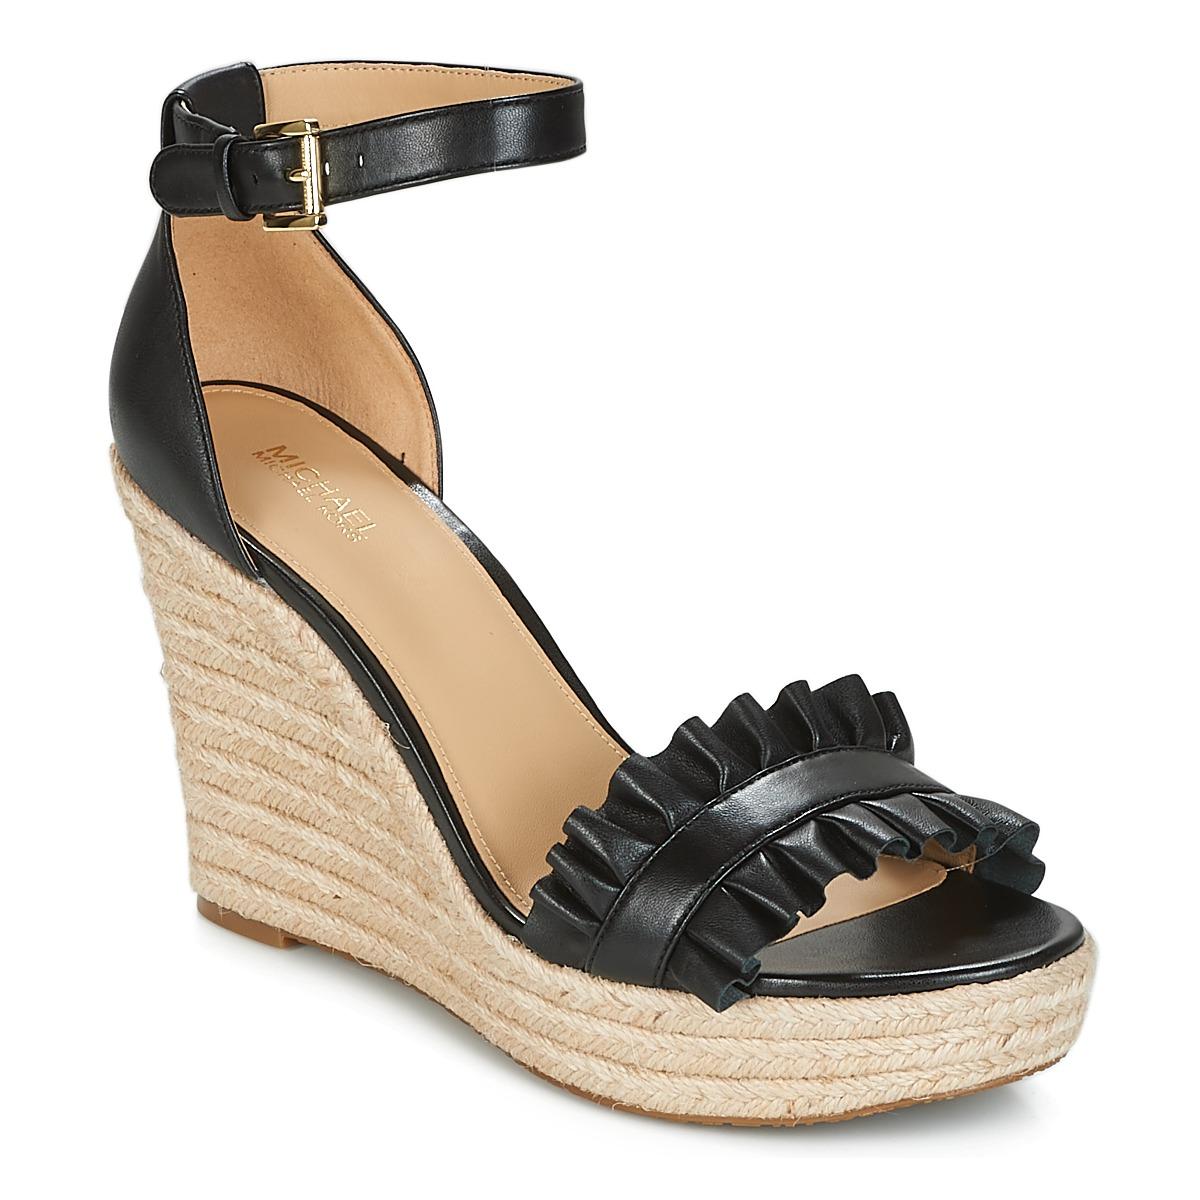 b383e4f15d1f Details about Michael Kors Bella Wedge Womens Heeled Sandals Black 9.5 US    7.5 UK